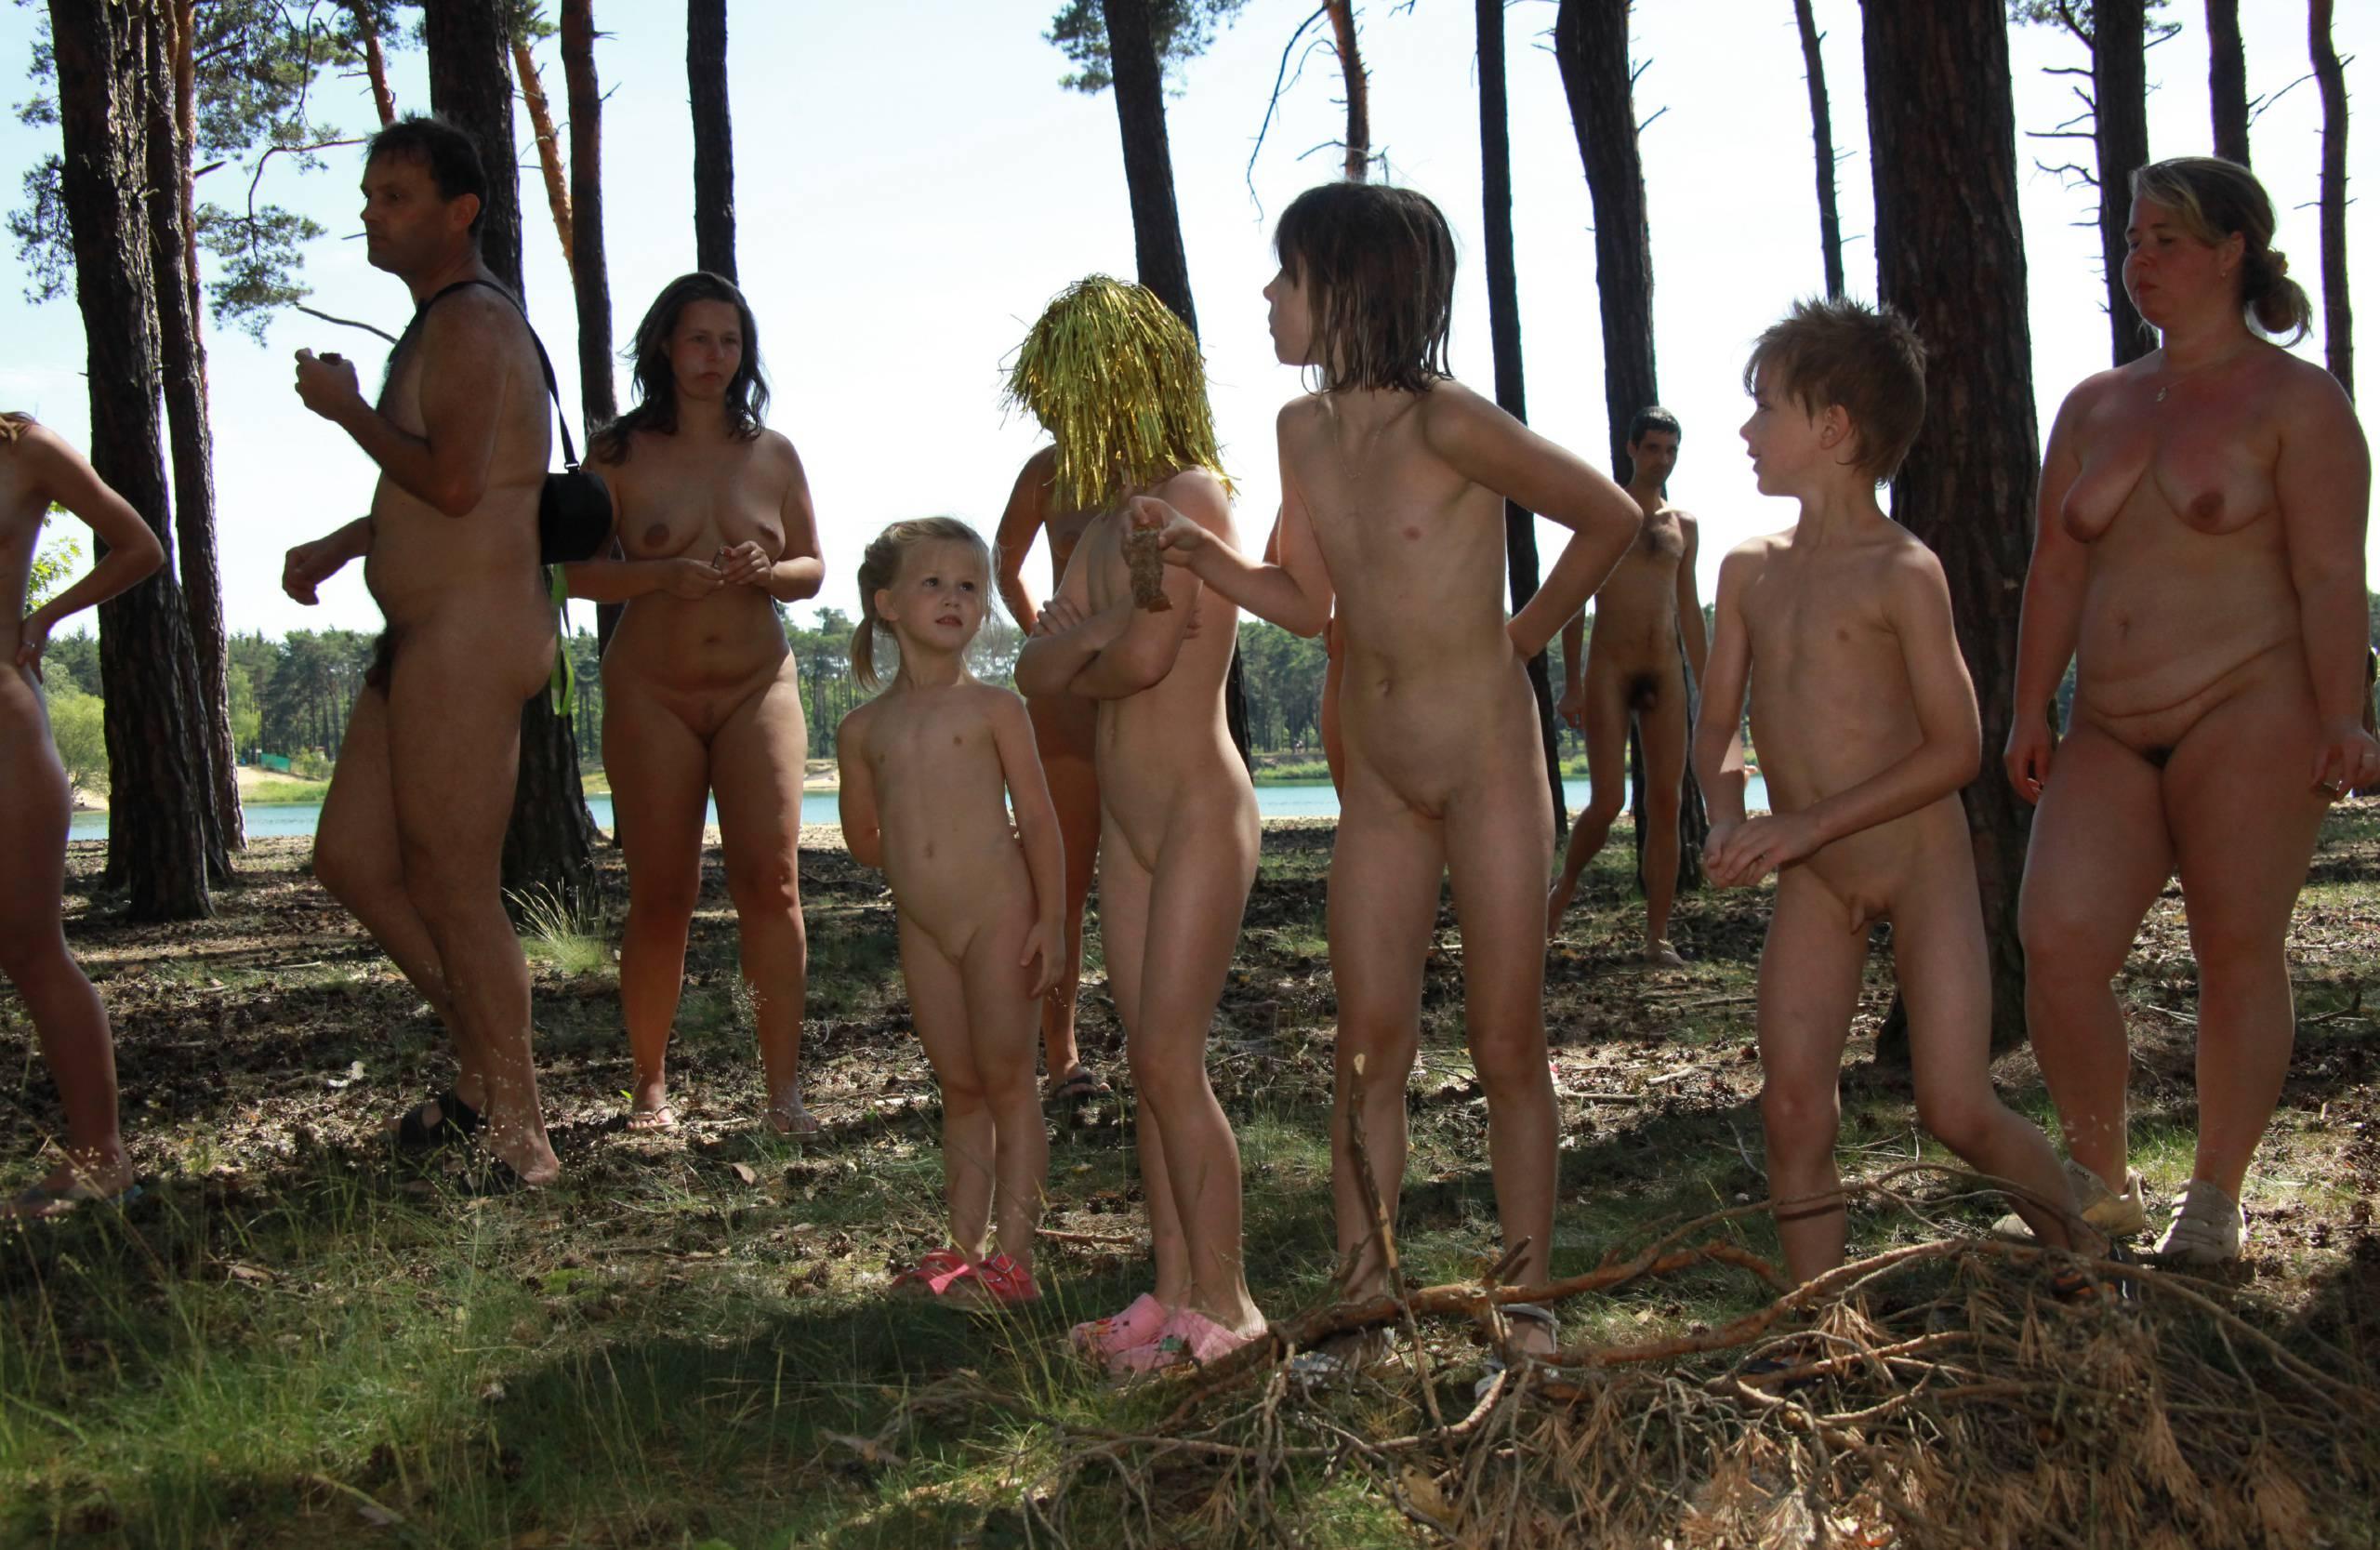 Pure Nudism Gallery Summer Sun Nudists - 3